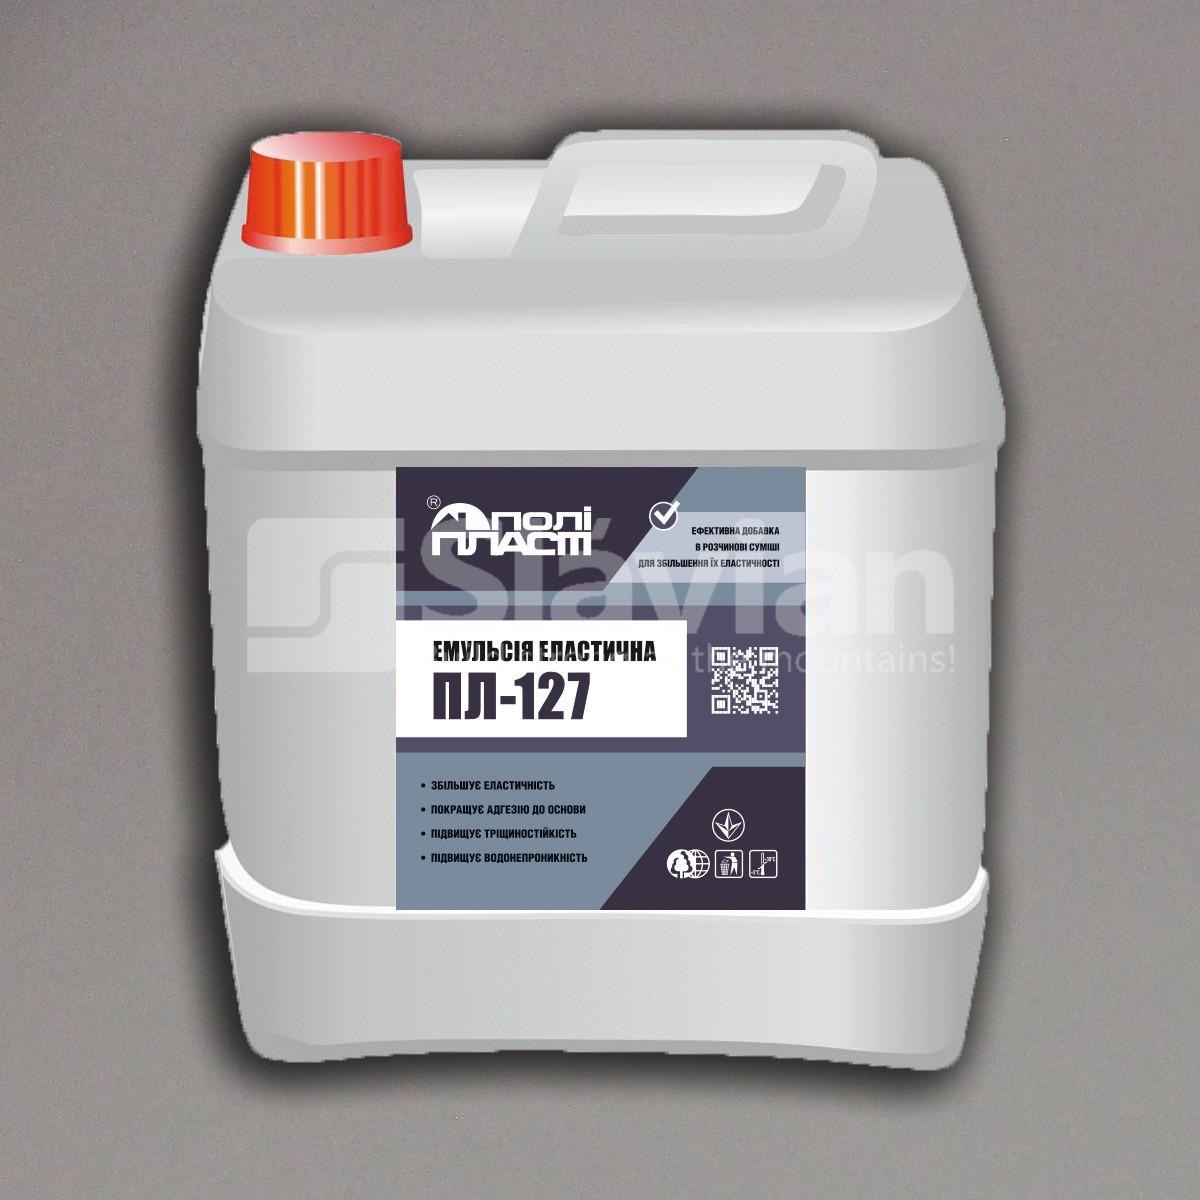 Эмульсия эластичная ПЛ-127